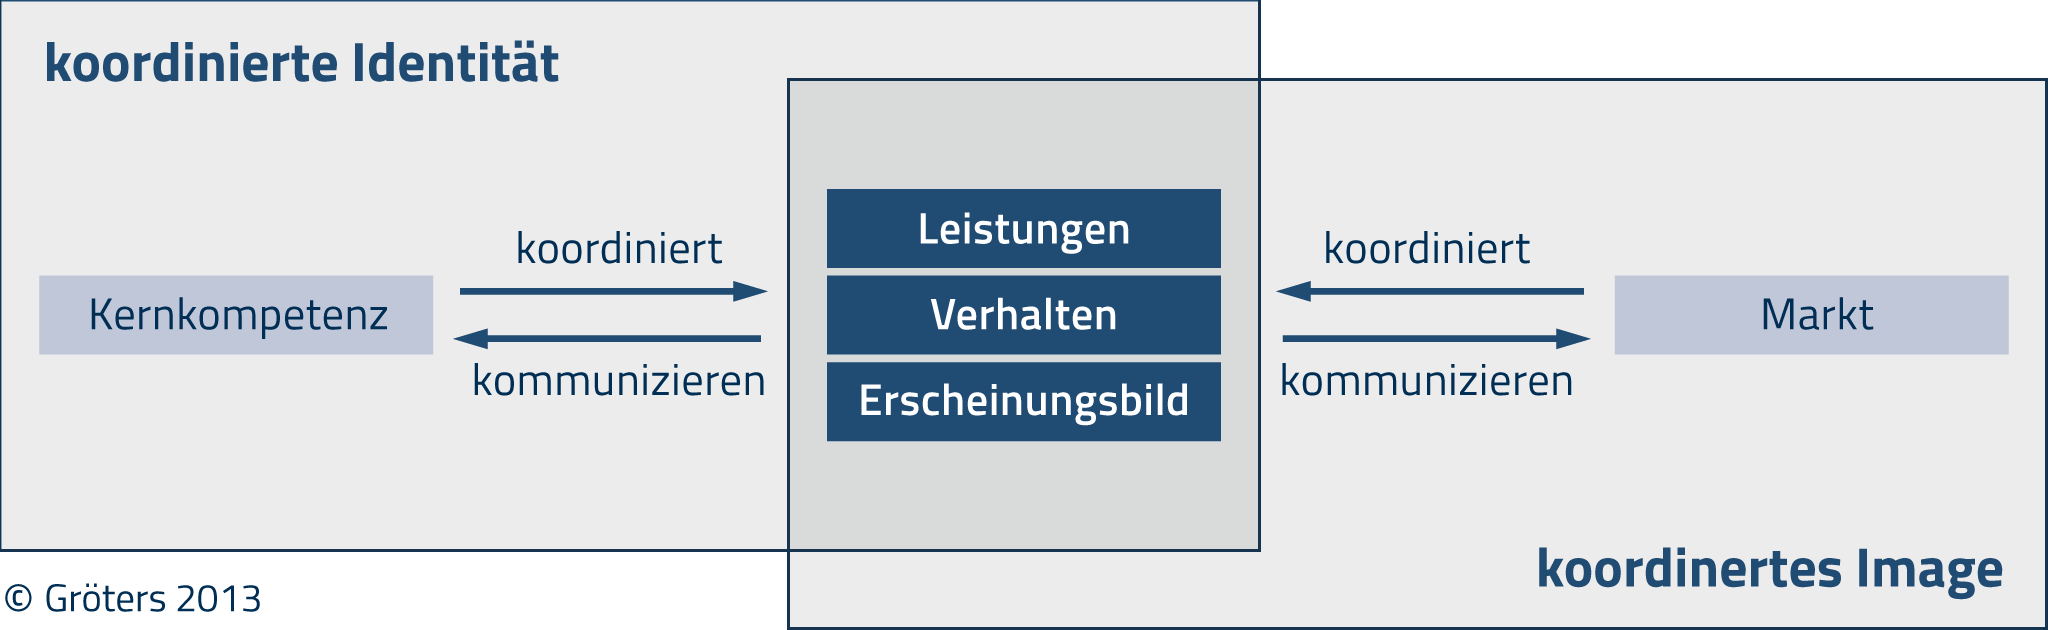 Corporate Identity und Image